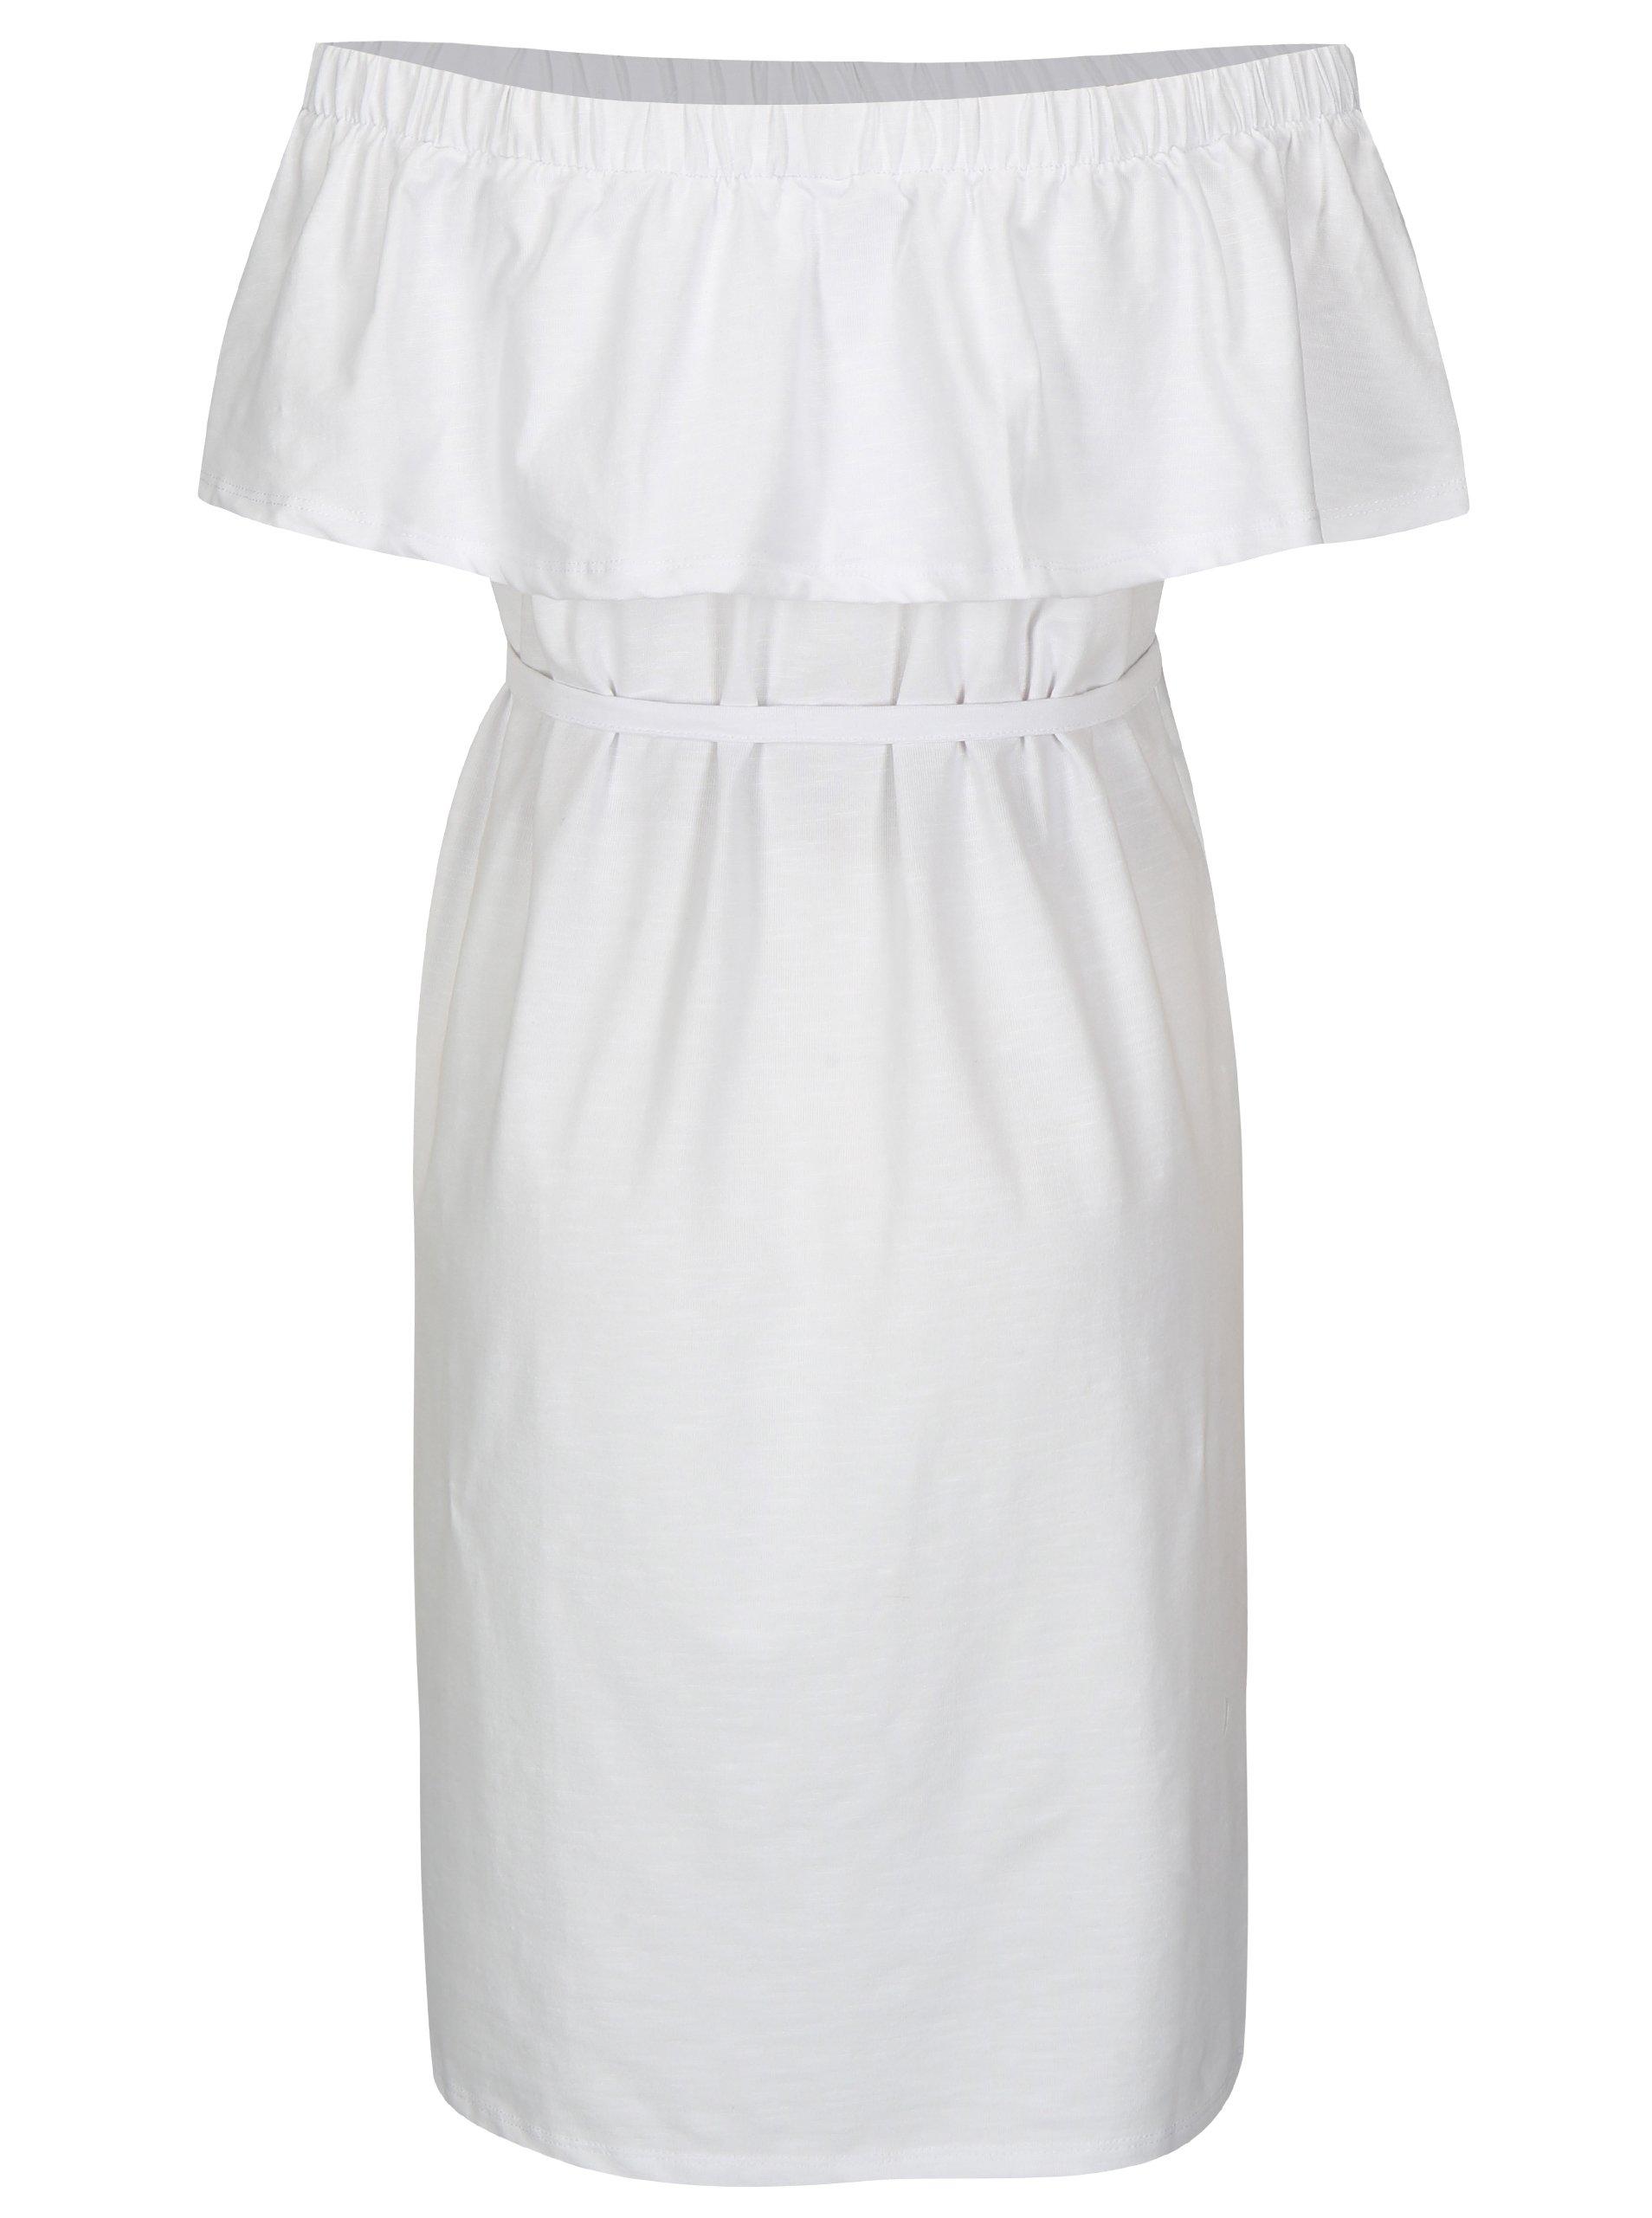 67ba885efb2d Biele tehotenské šaty s odhalenými ramenami Mama.licious Heart